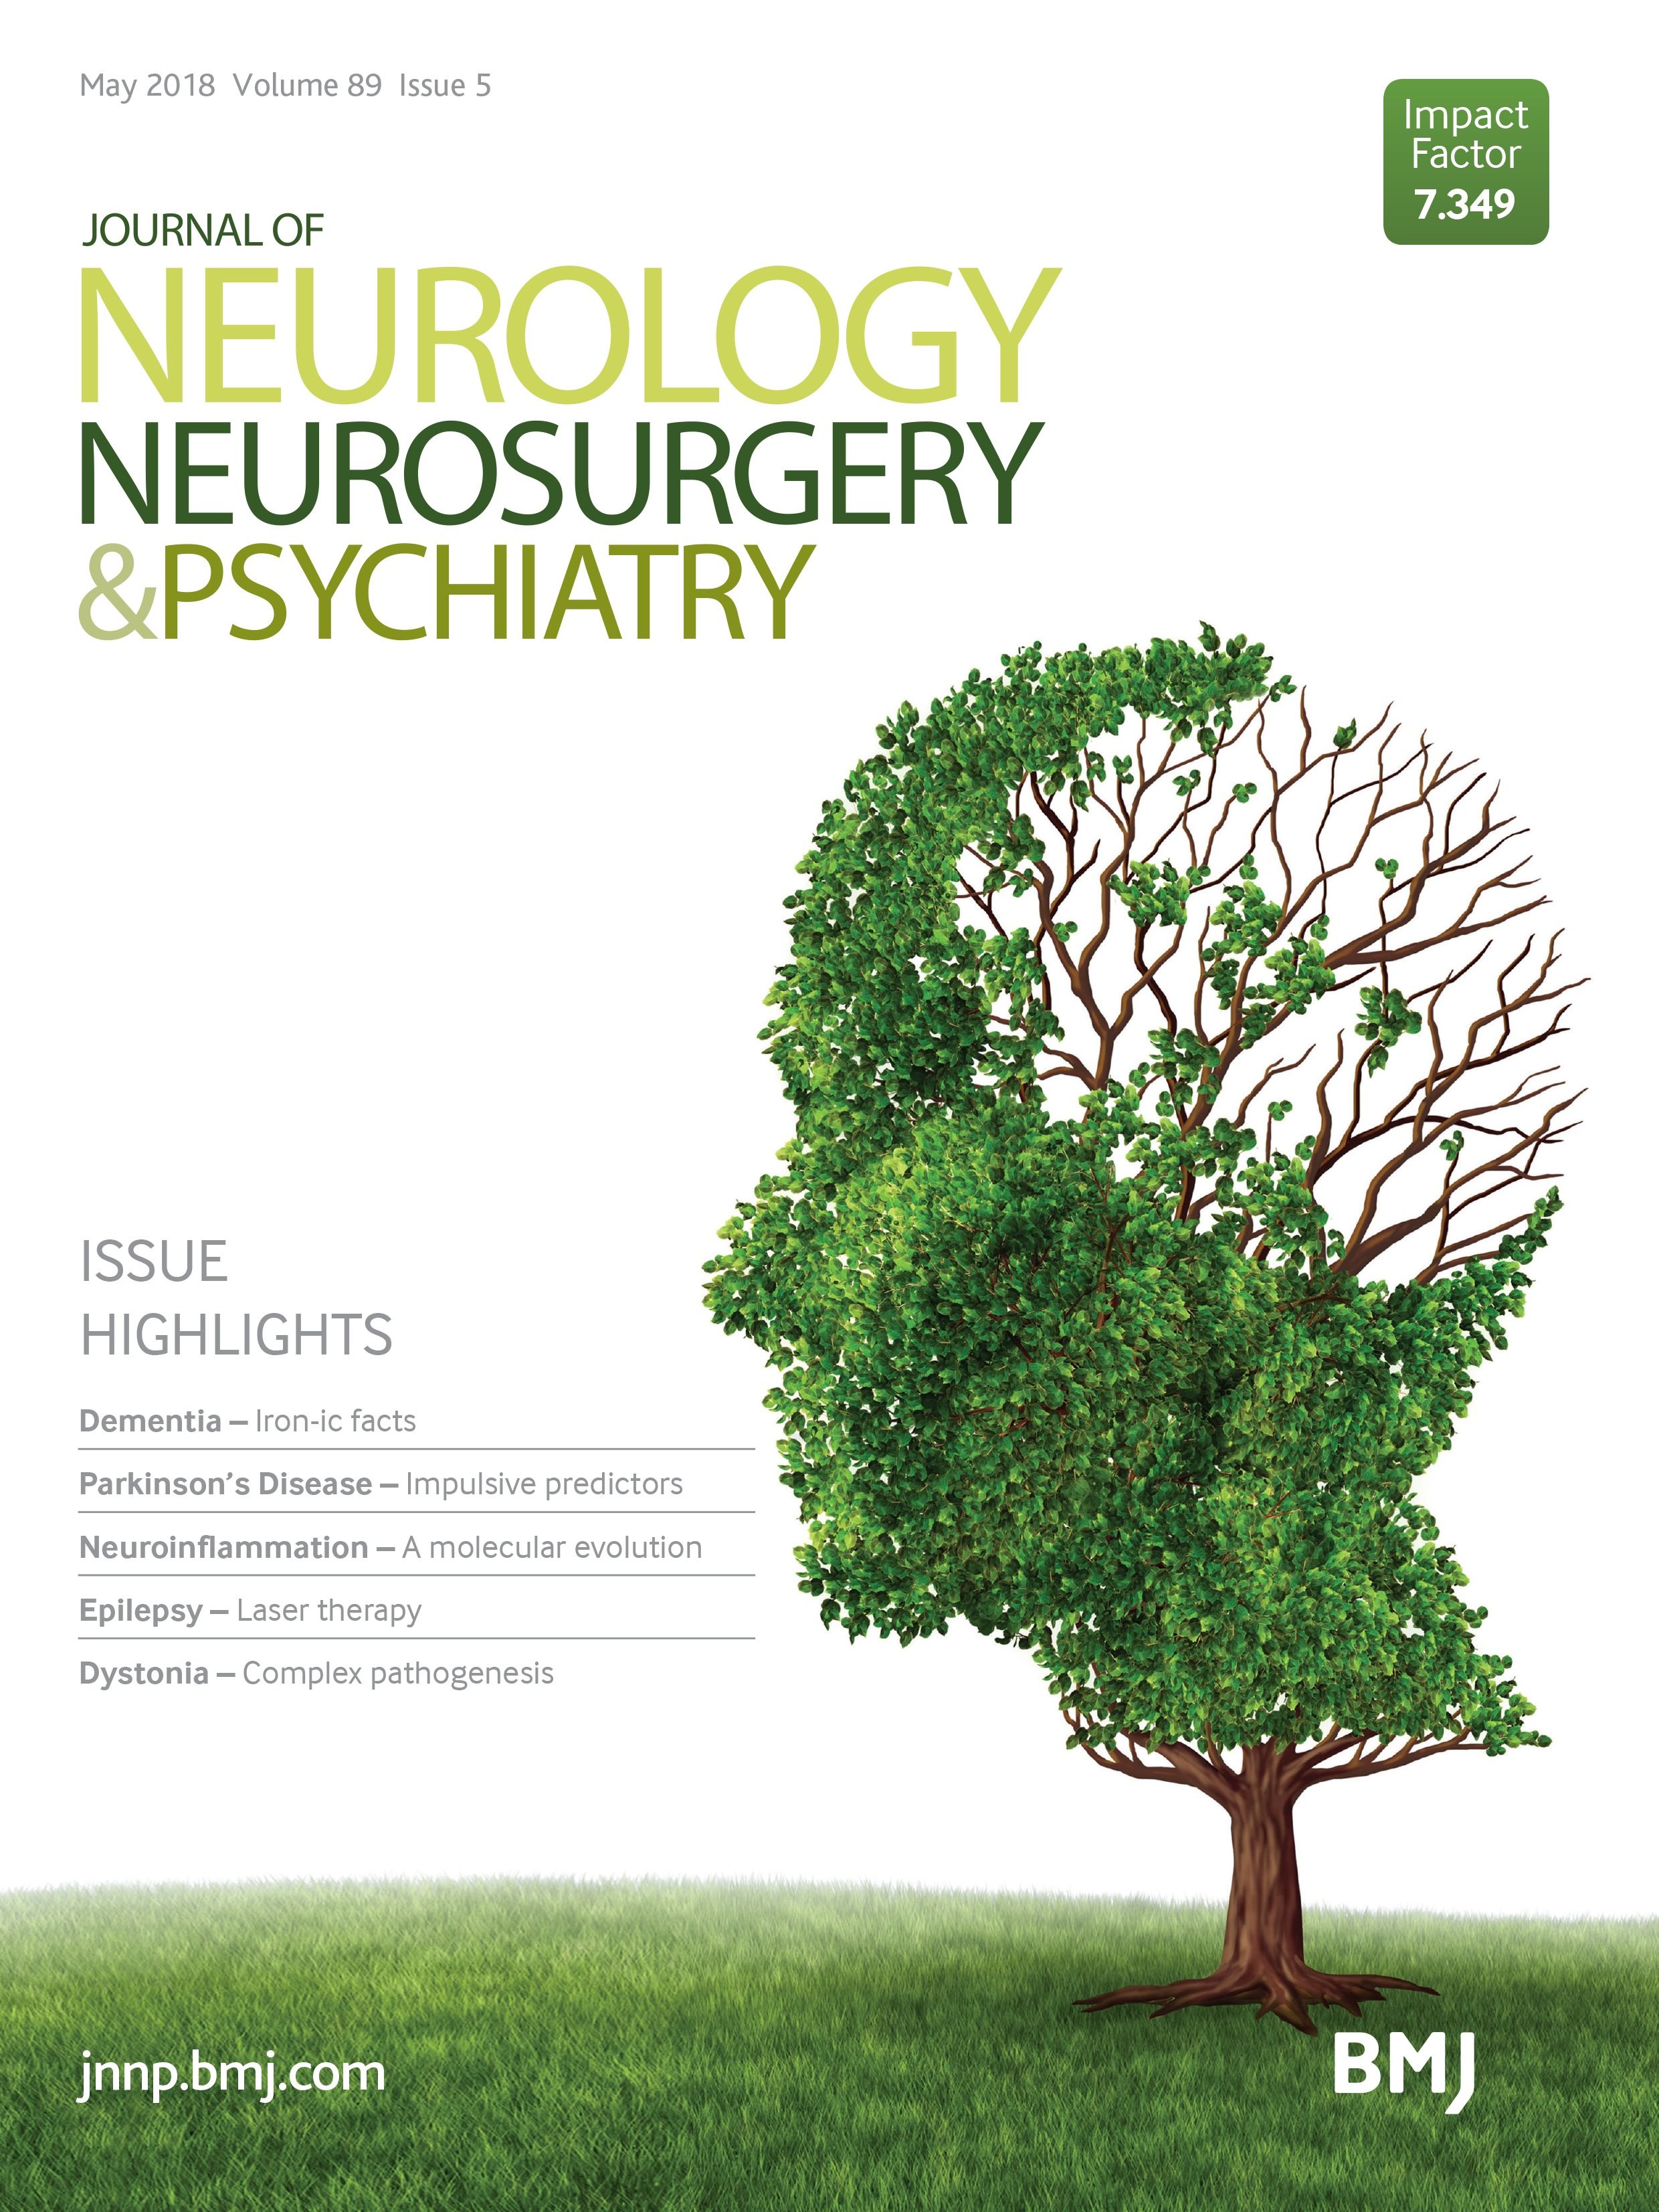 Pathogenesis Of Dystonia Is It Cerebellar Or Basal Ganglia Origin Journal Neurology Neurosurgery Psychiatry